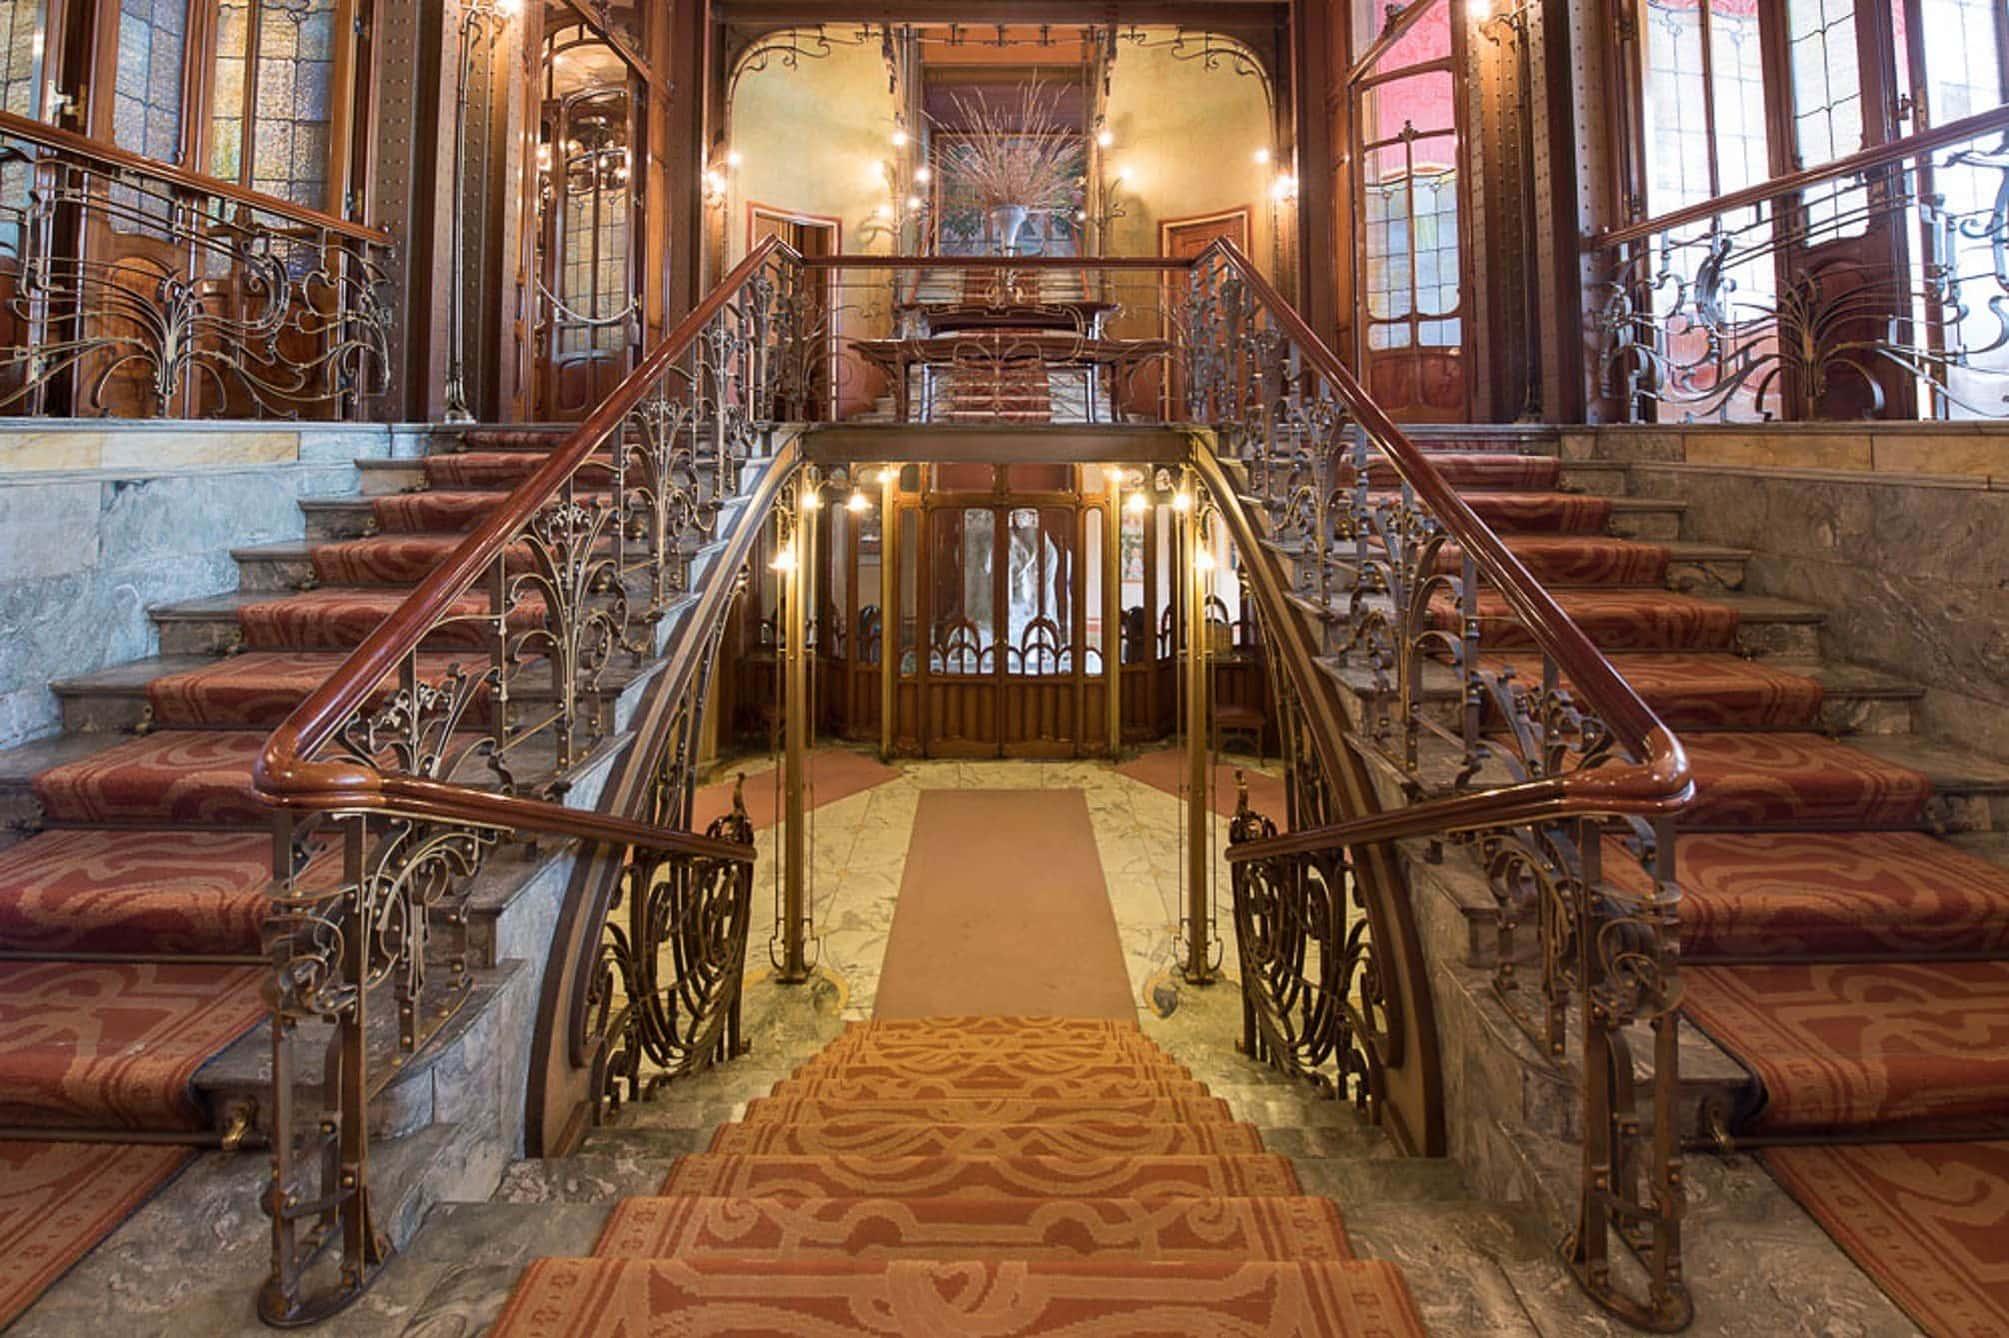 Hôtel Solvay ©EB - Photographe Voituron